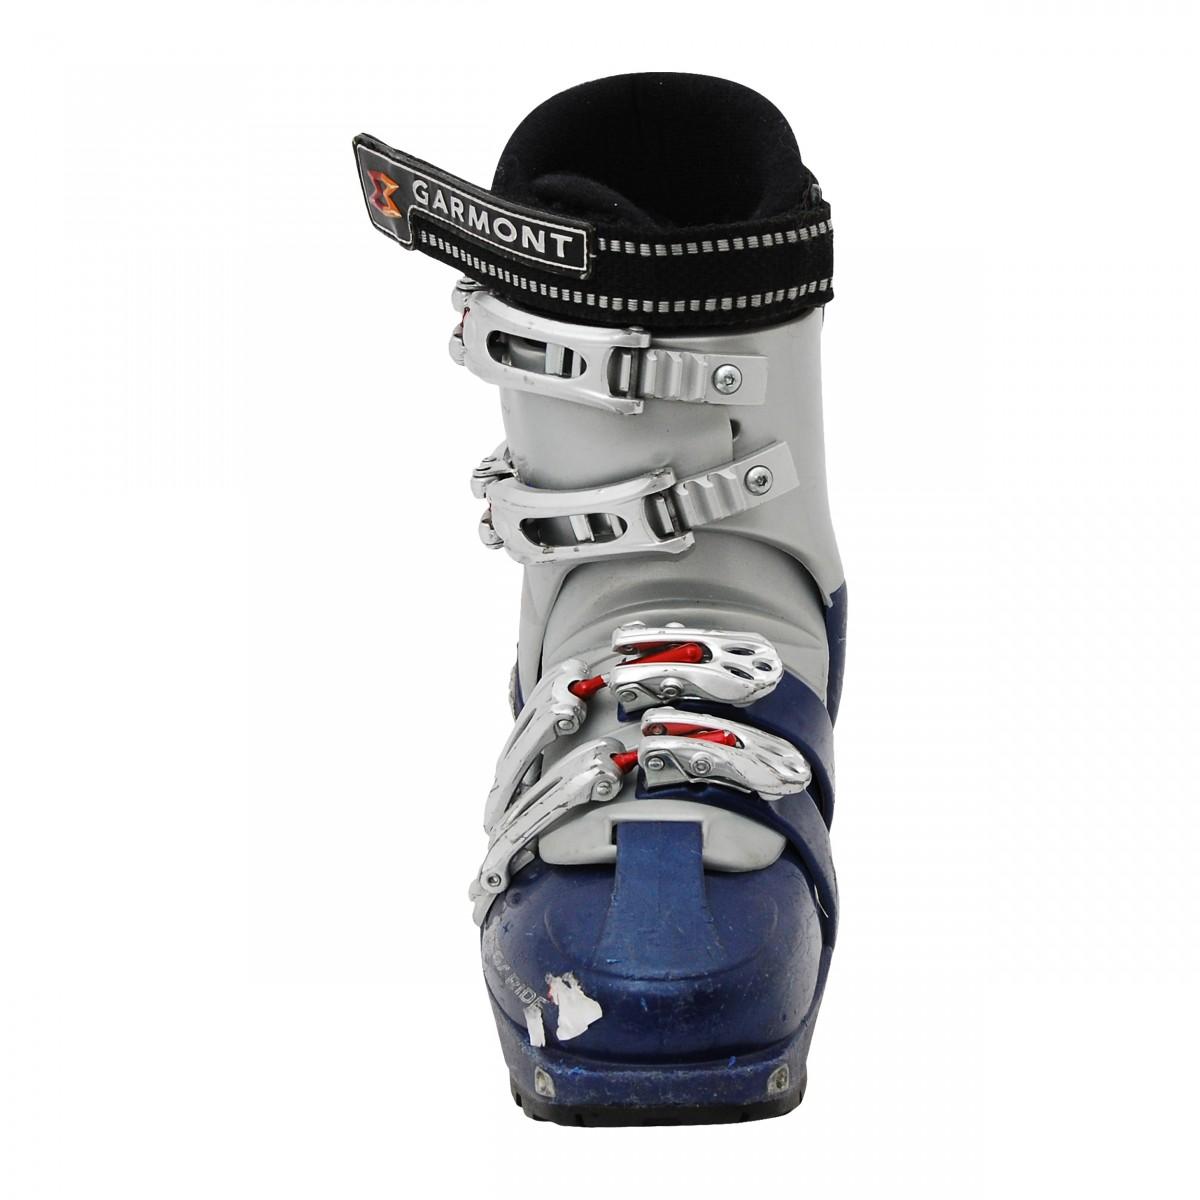 Chaussure-de-ski-rando-occasion-Garmont-Megaride-mg-bleu miniature 5